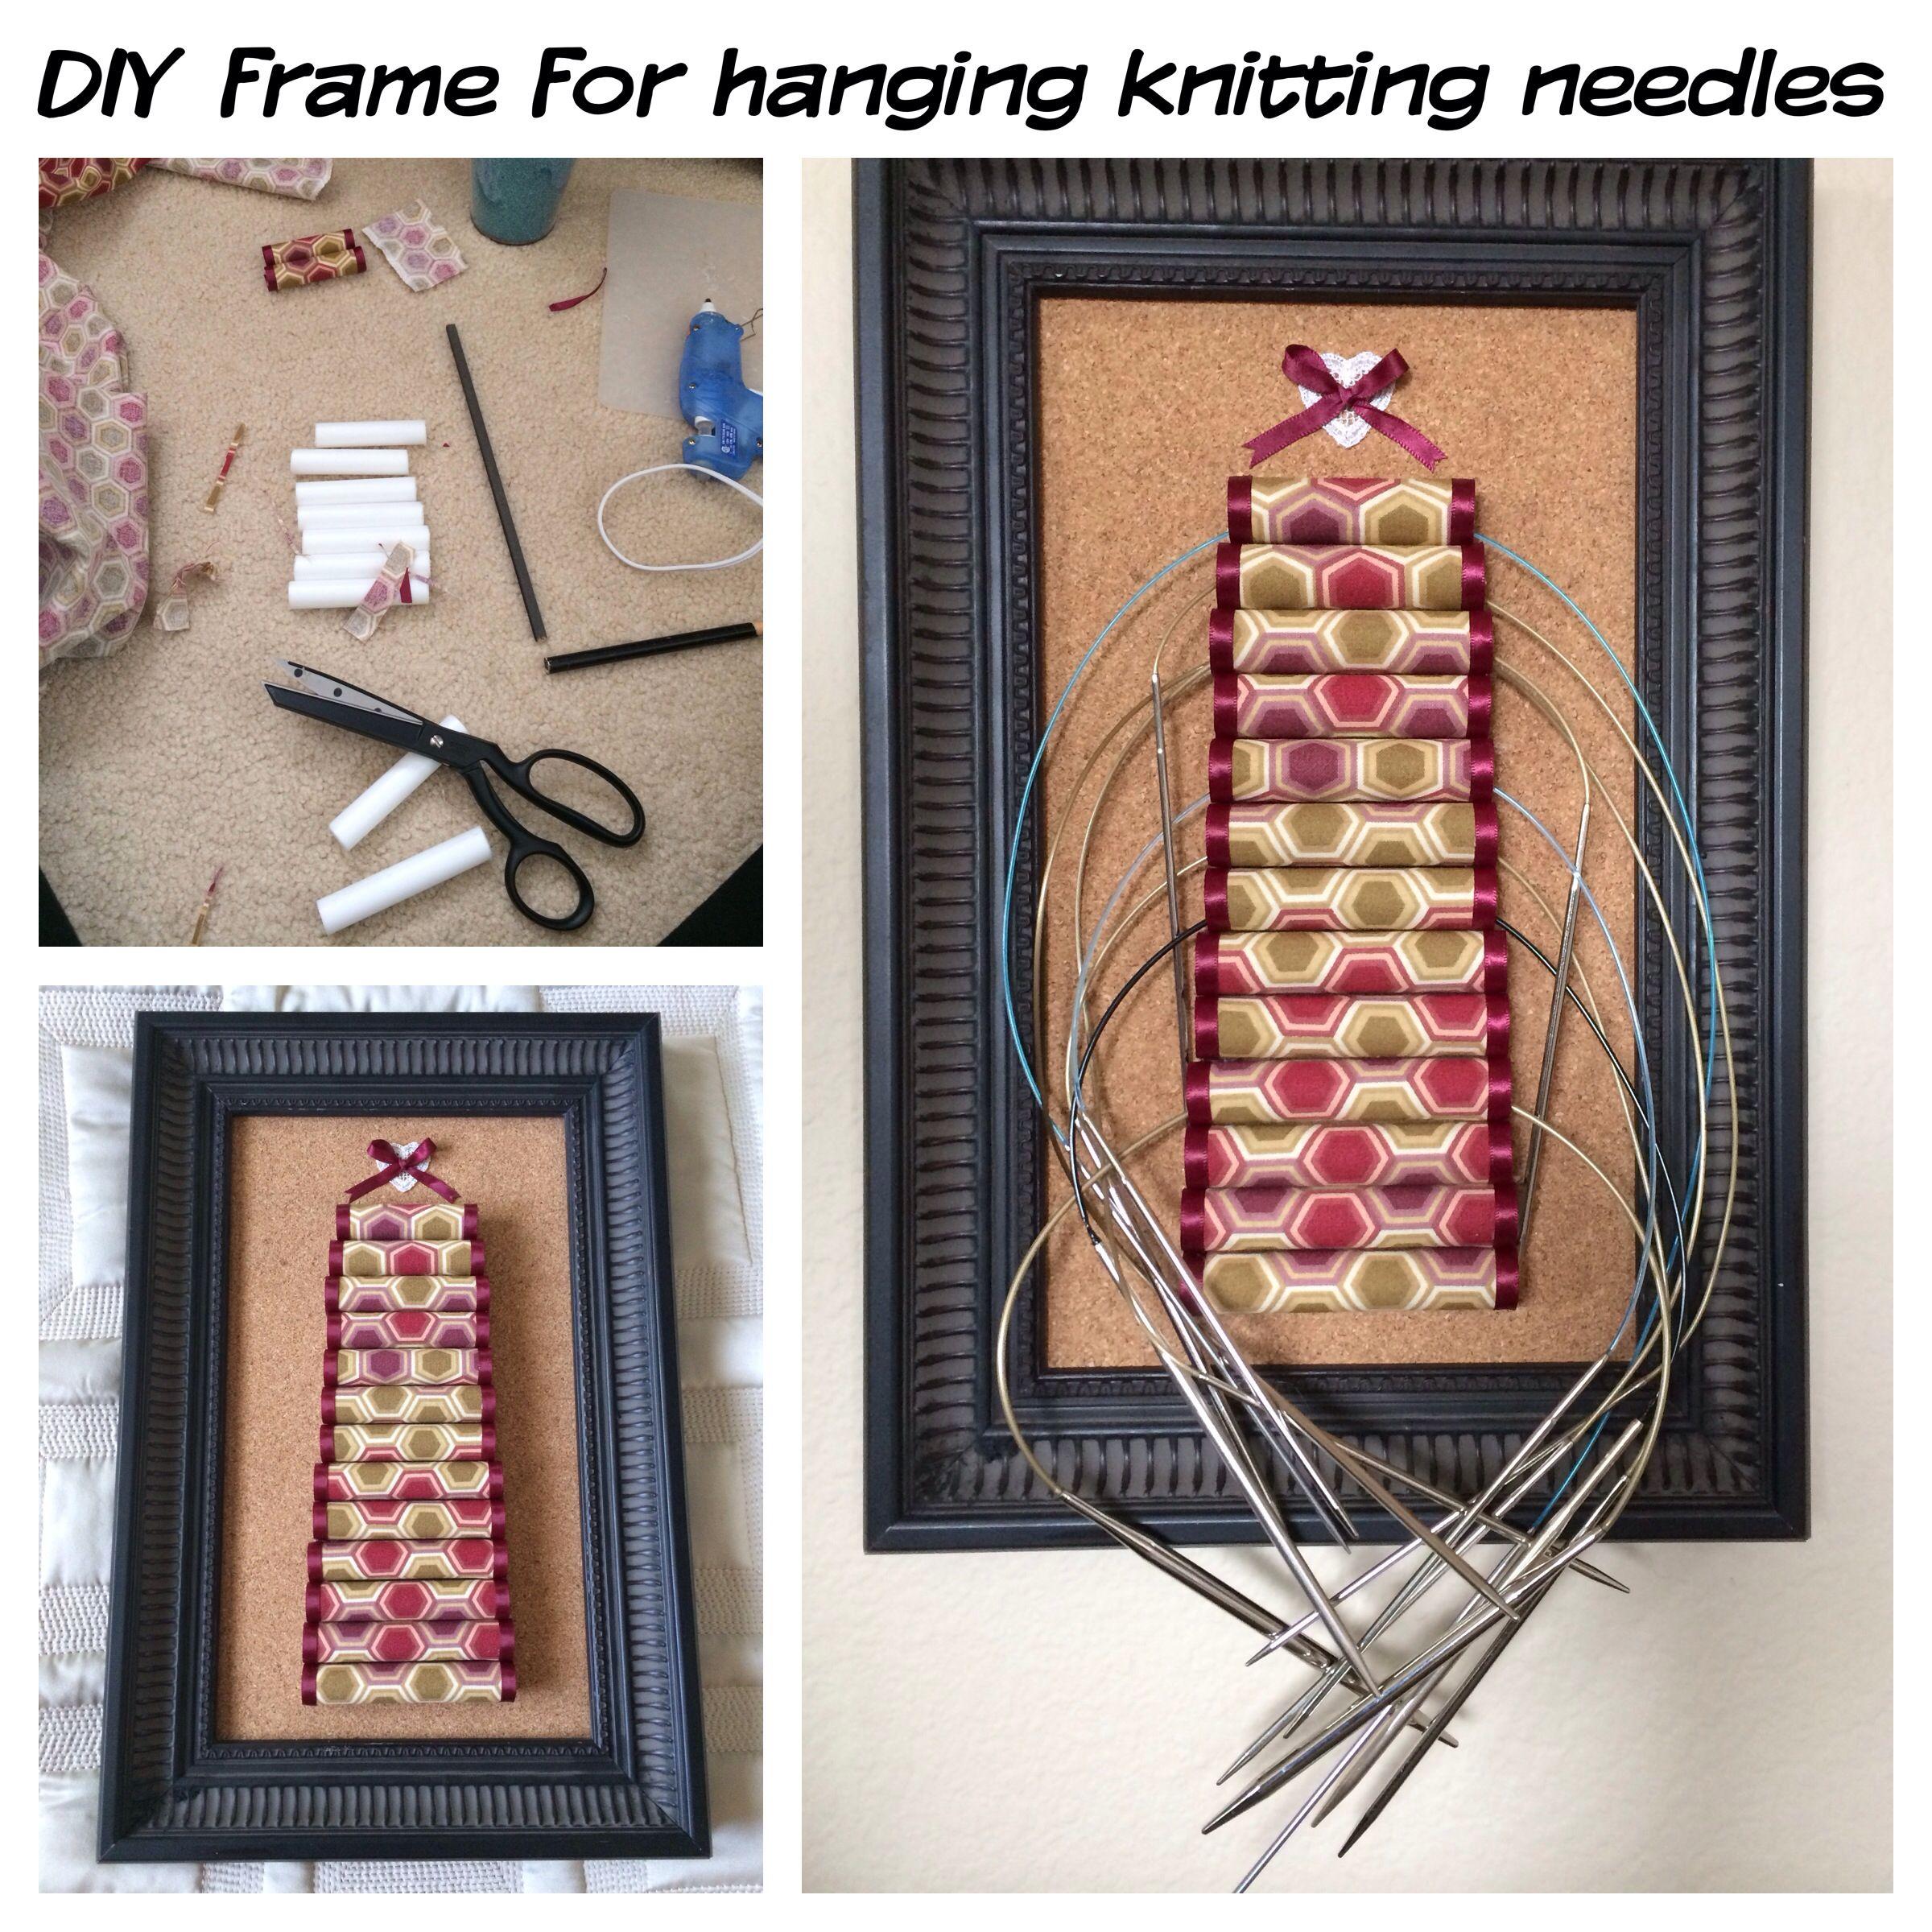 Diy Frame For Hanging Knitting Needles